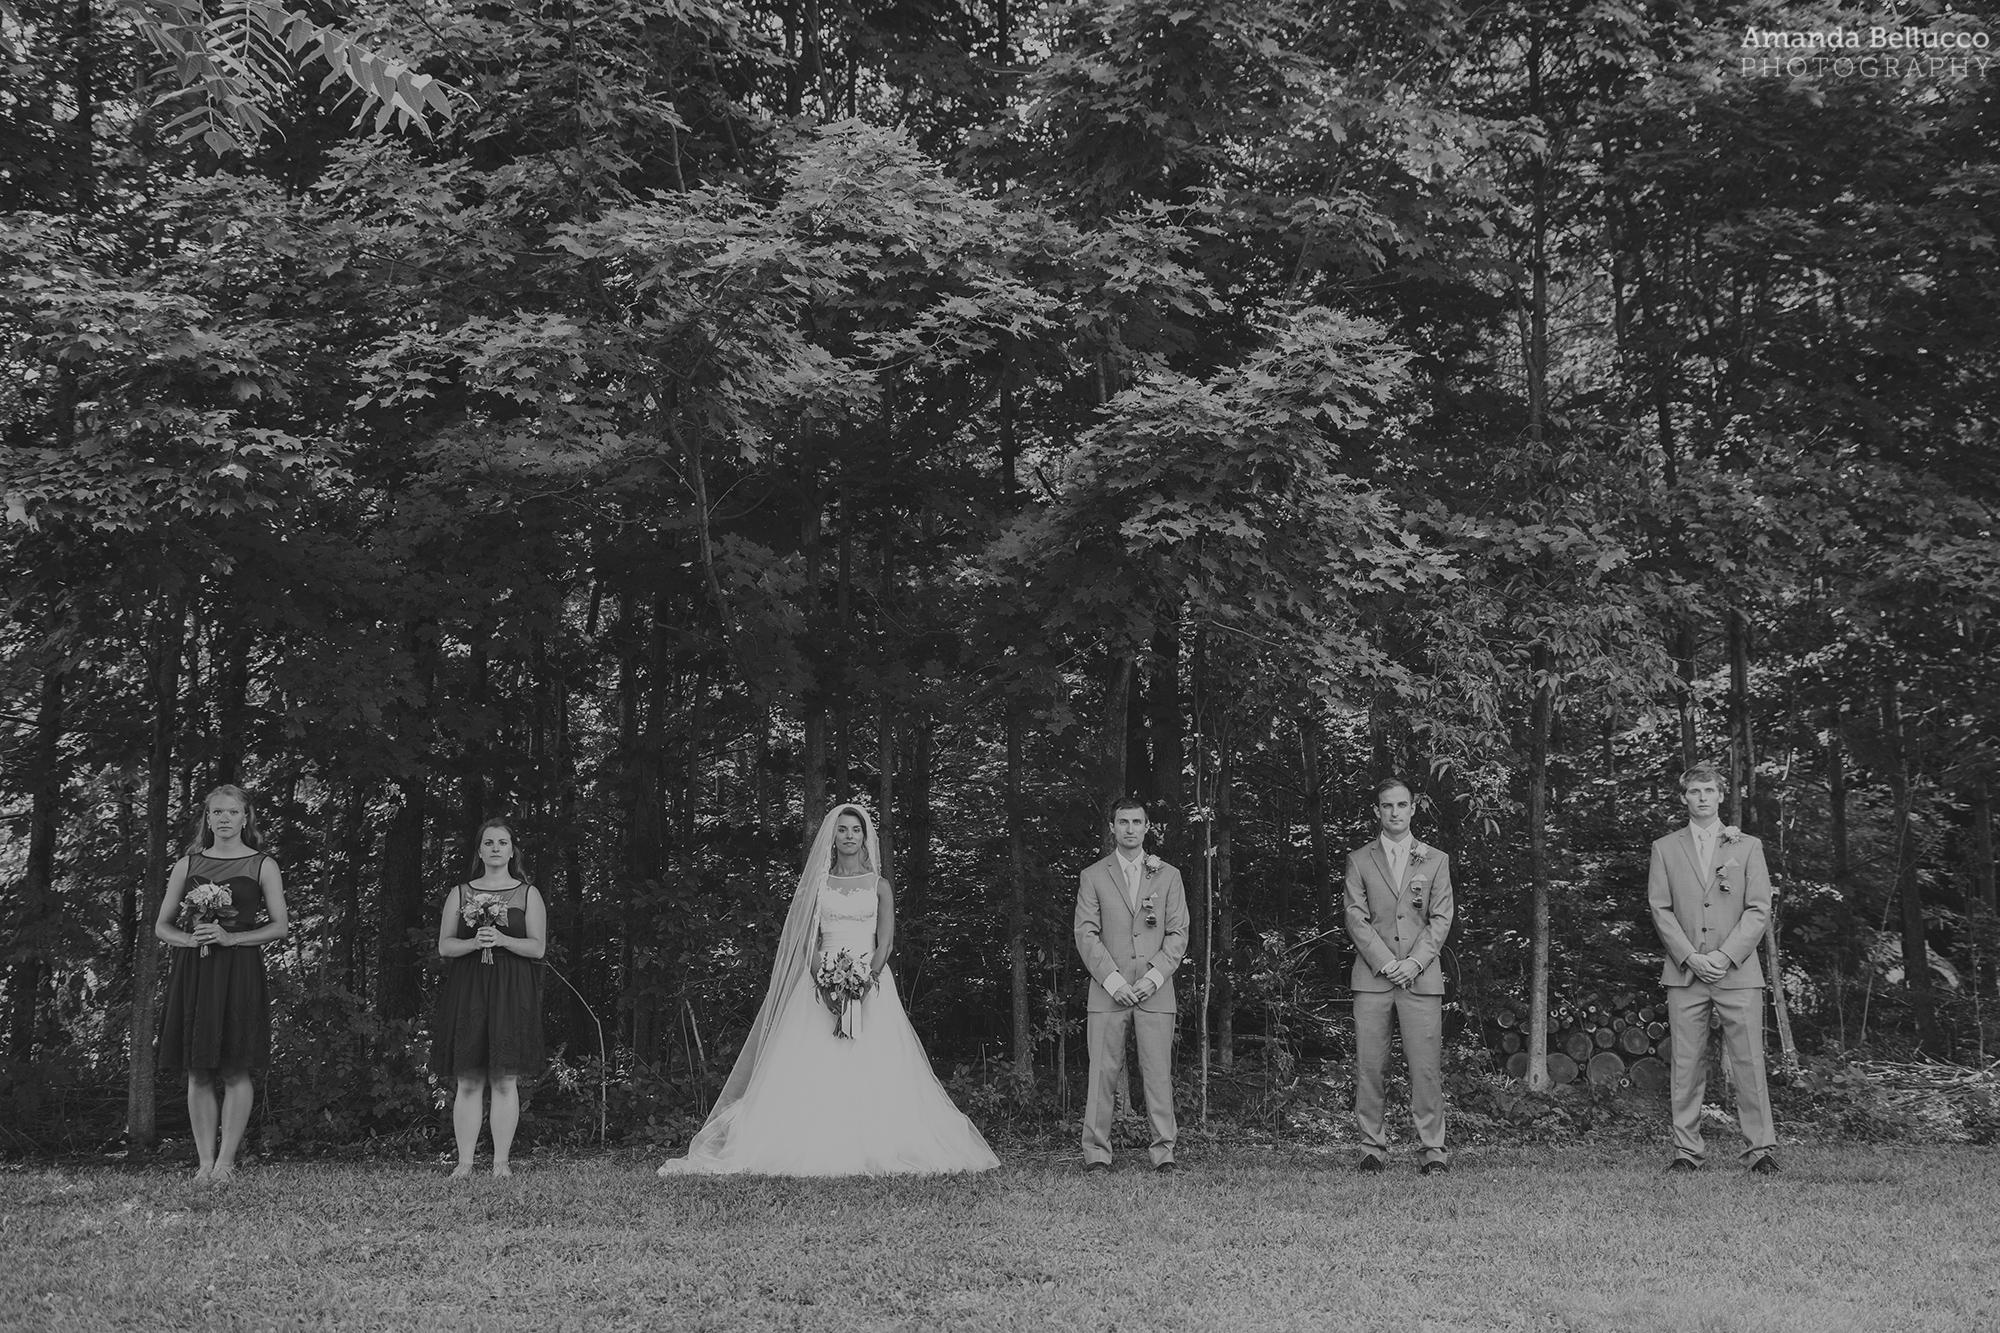 buffalo_ny_wedding_photographer_55.jpg